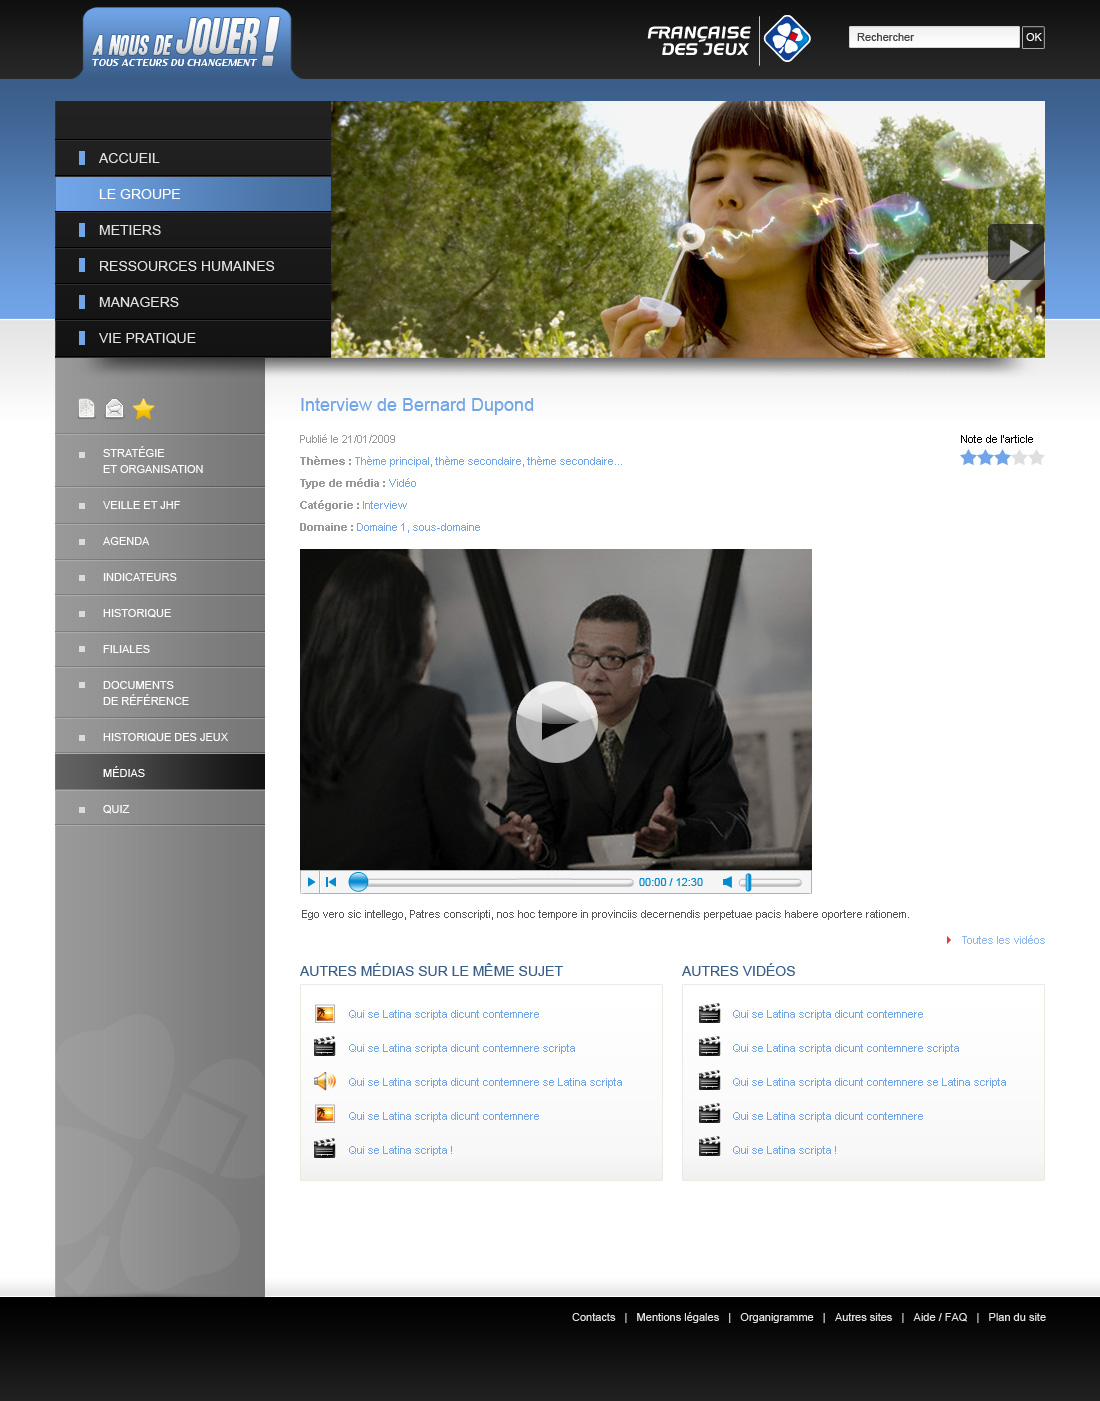 fdj-intranet-2